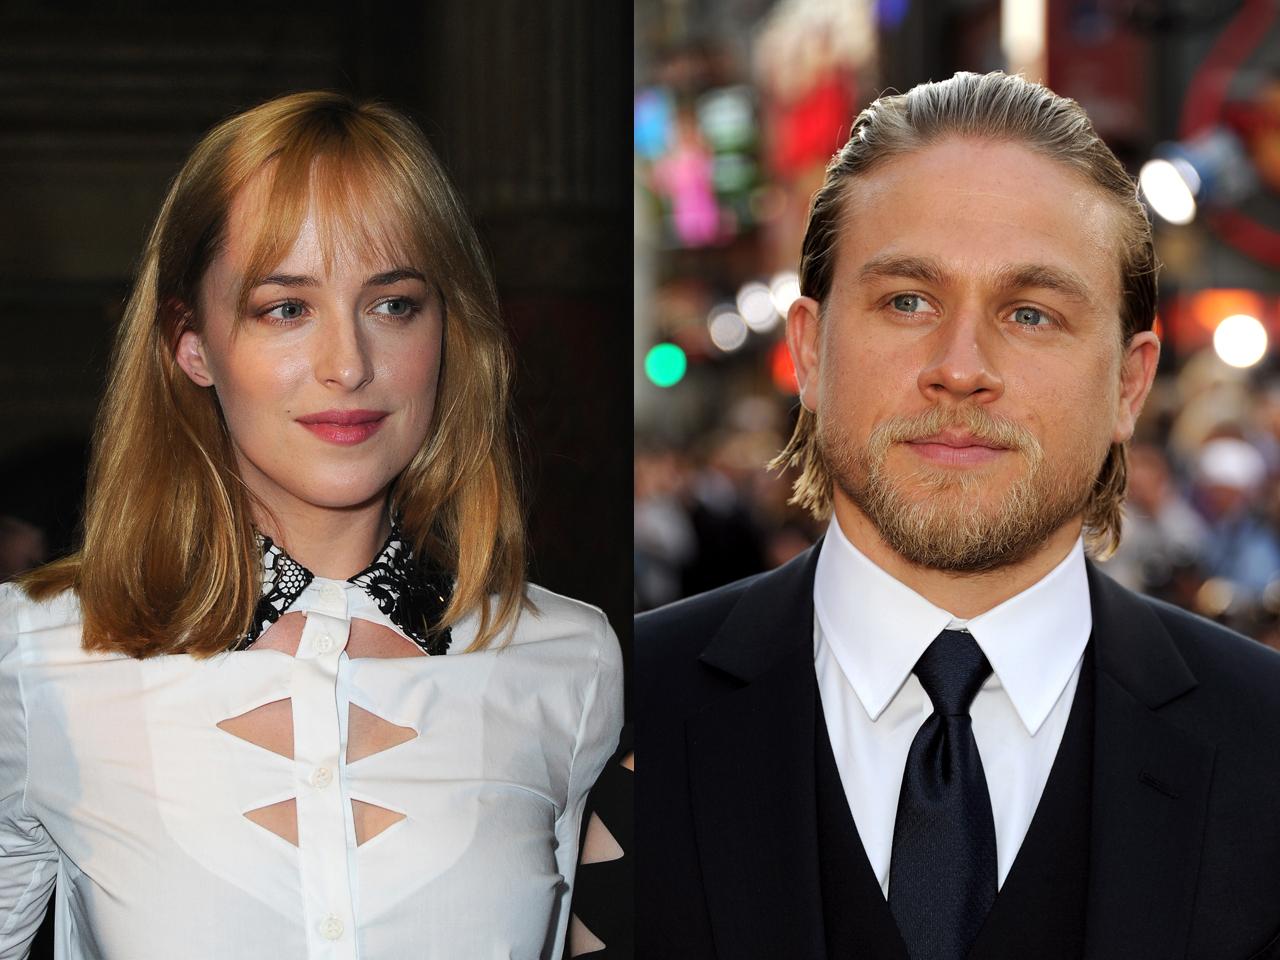 Dakota Johnson Charlie Hunnam Cast In Fifty Shades Of Grey Film